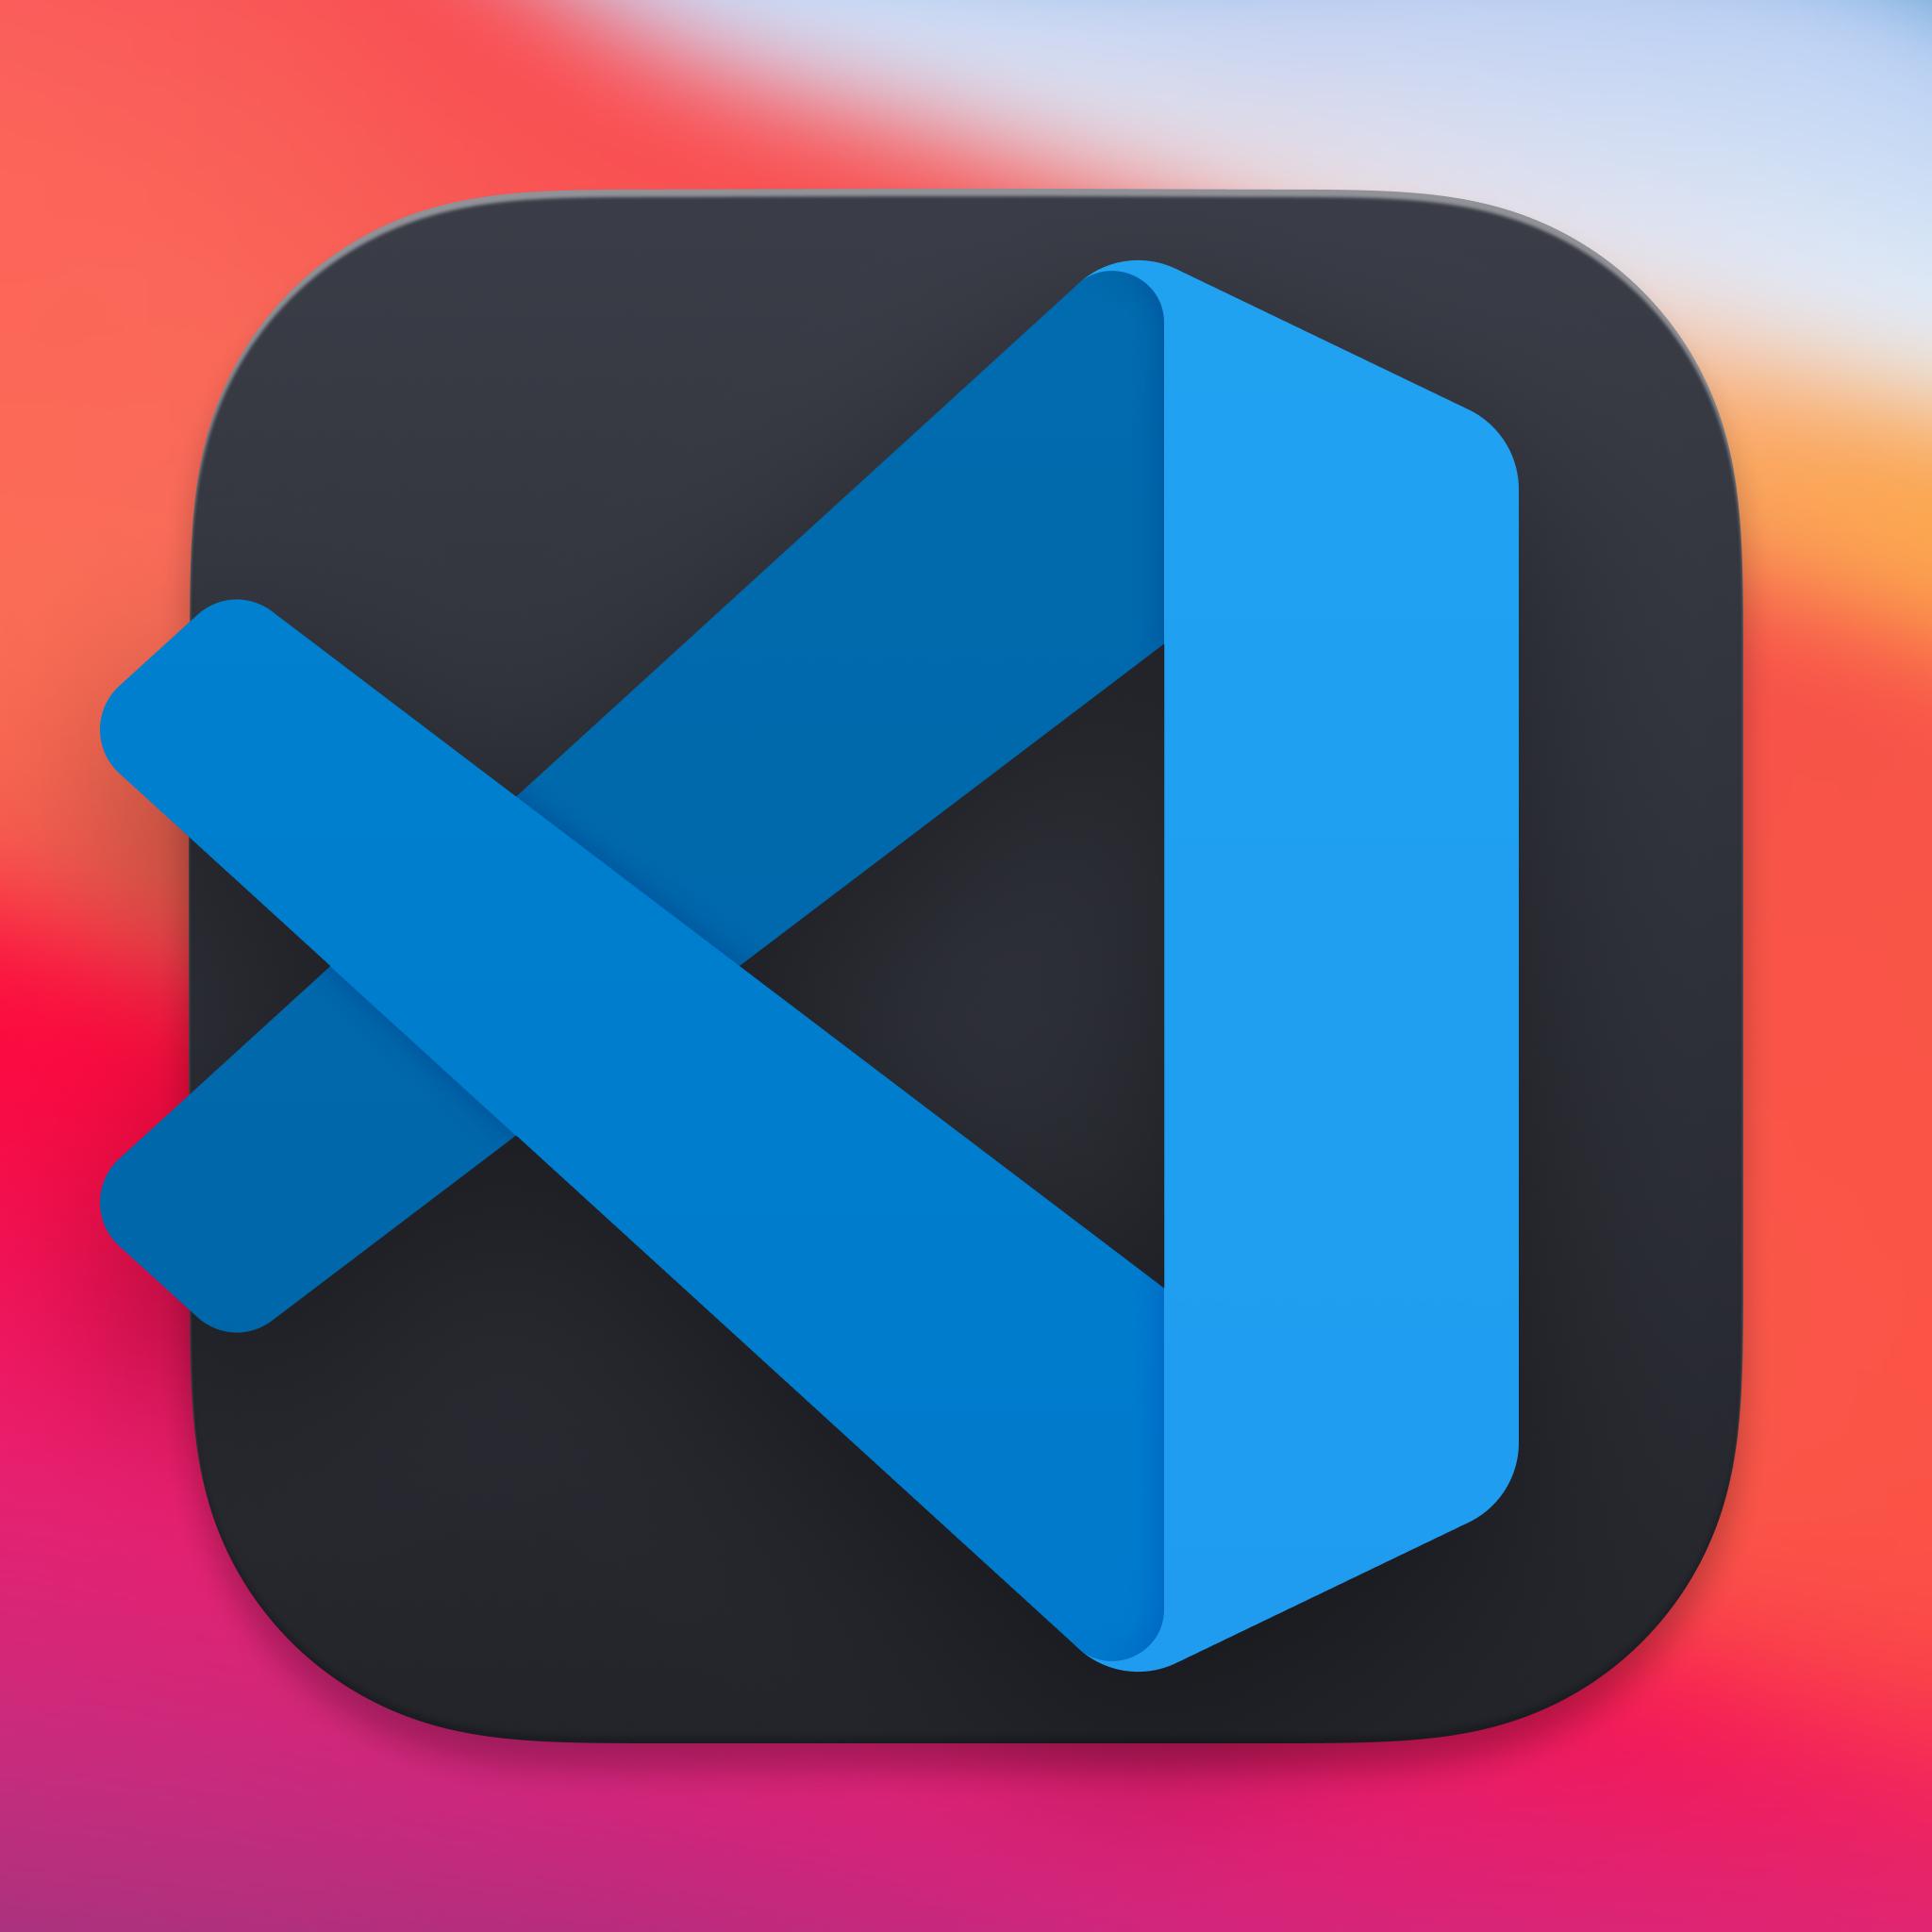 dark-overhang-vscode-icon